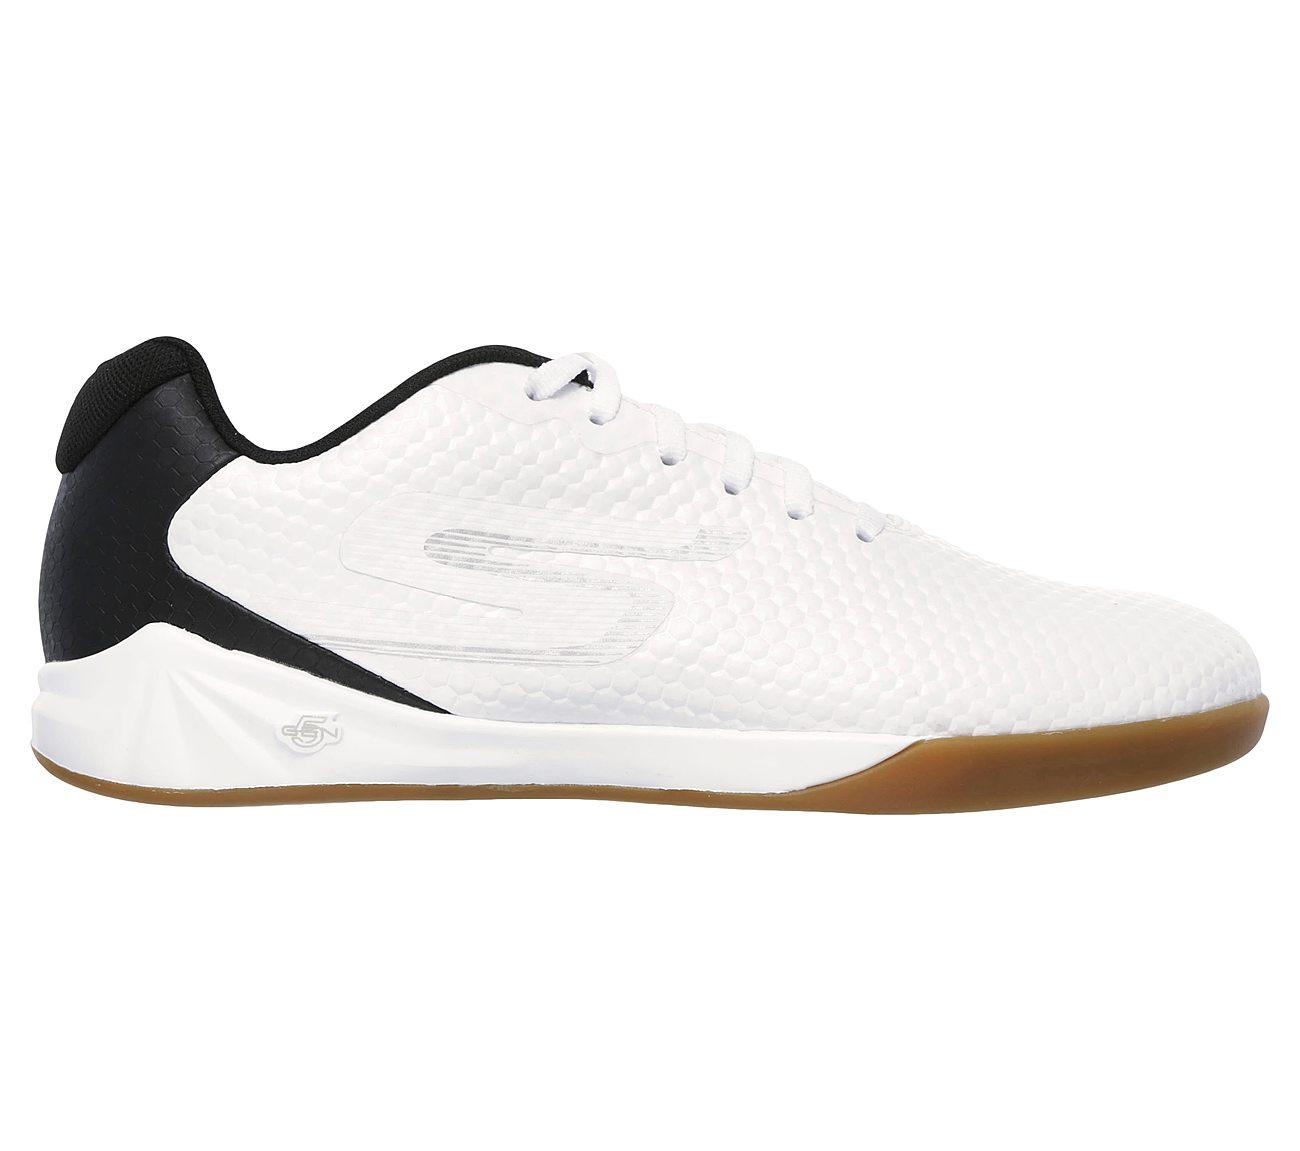 5b7164f00 Buy SKECHERS Skechers Performance - Soccer Leverage Skechers ...